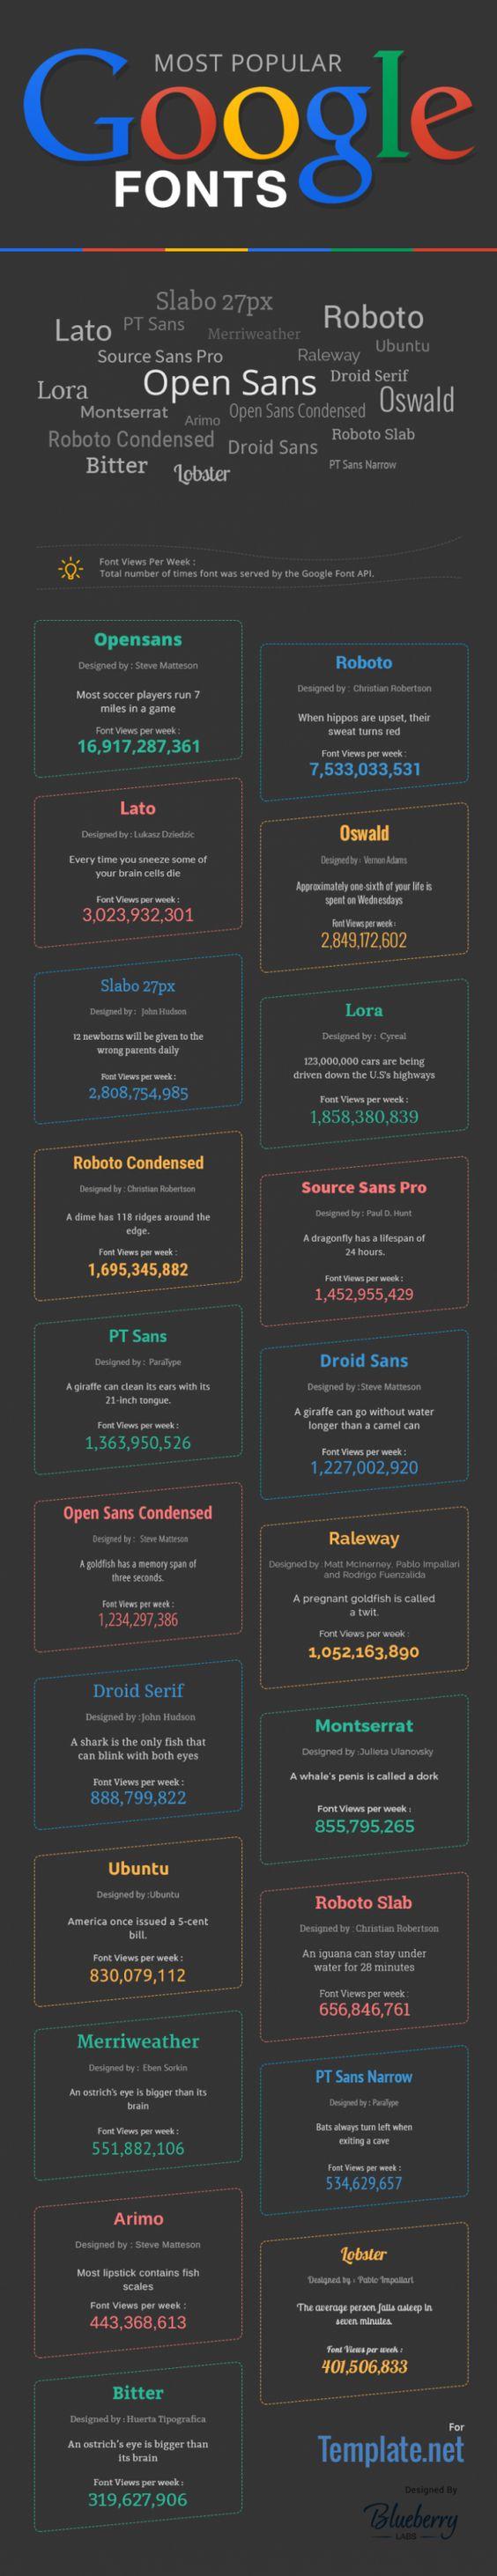 Popular-google-fonts